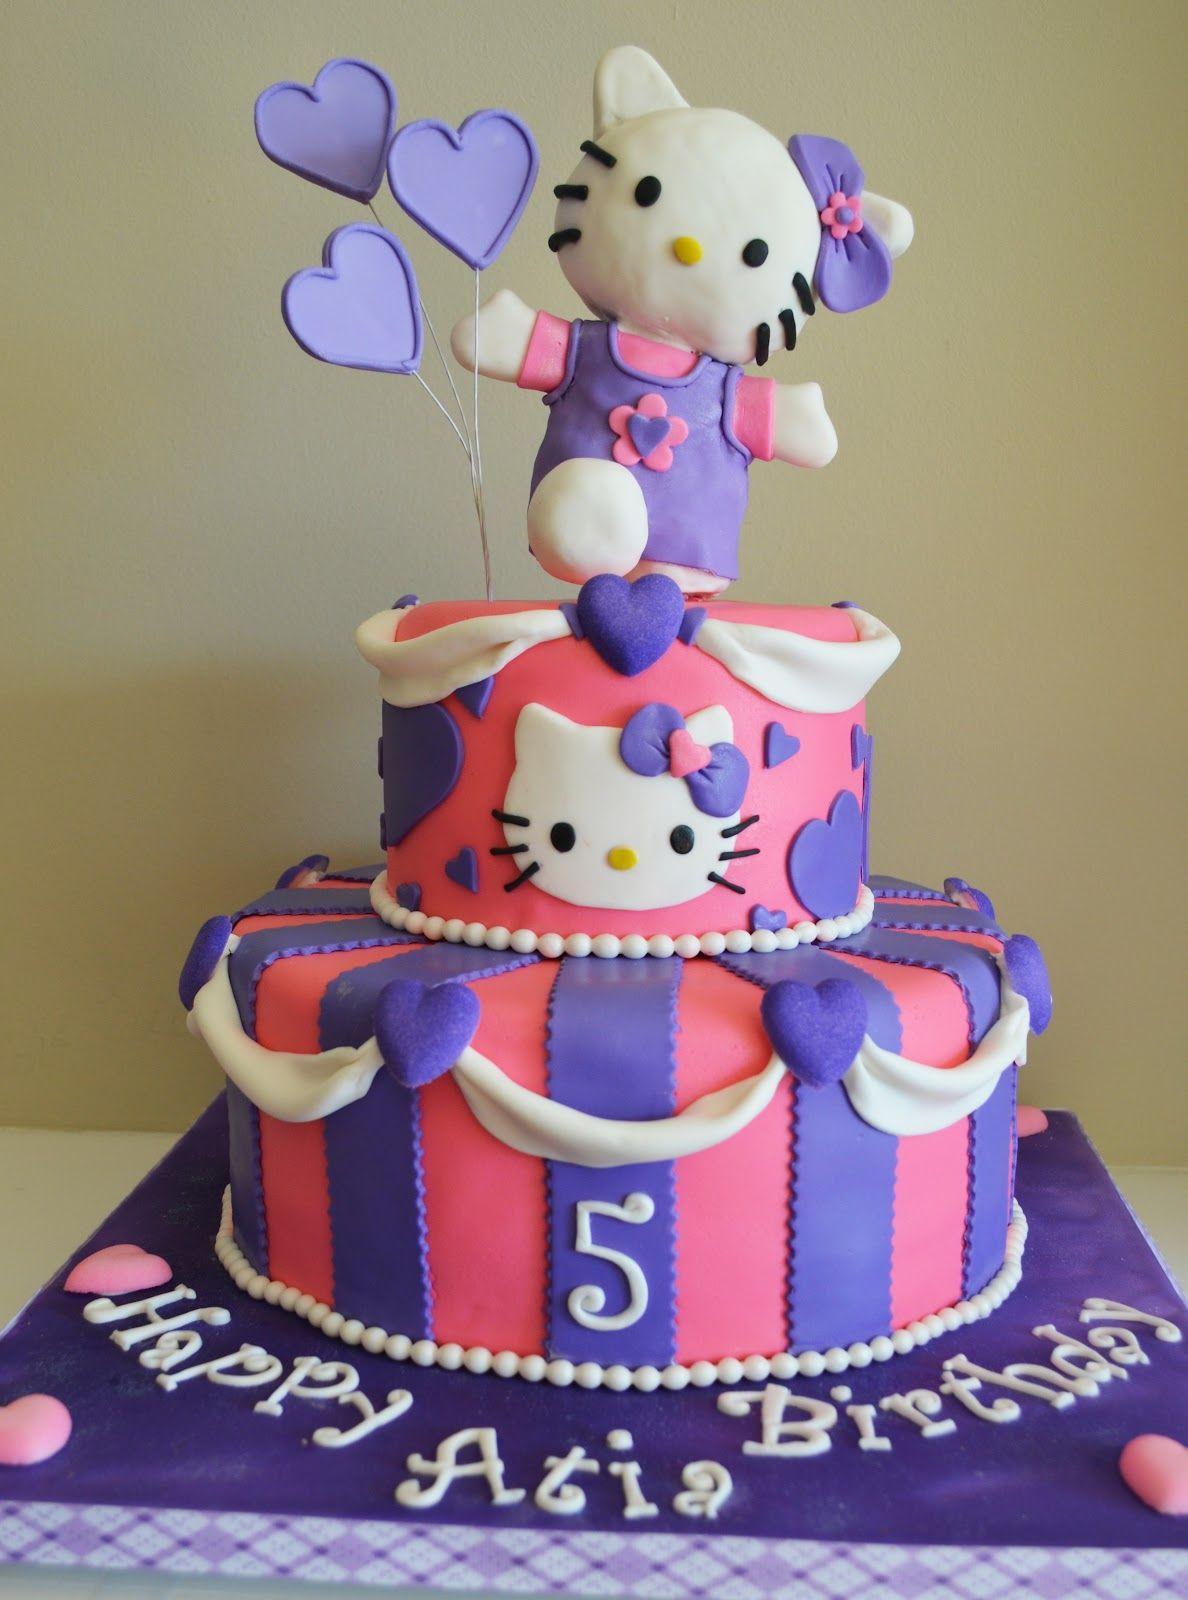 Maries Manor Hello Kitty: Tickled Pink Cakes: Hello Kitty Cake 1 Vote Vivien 1 Vote